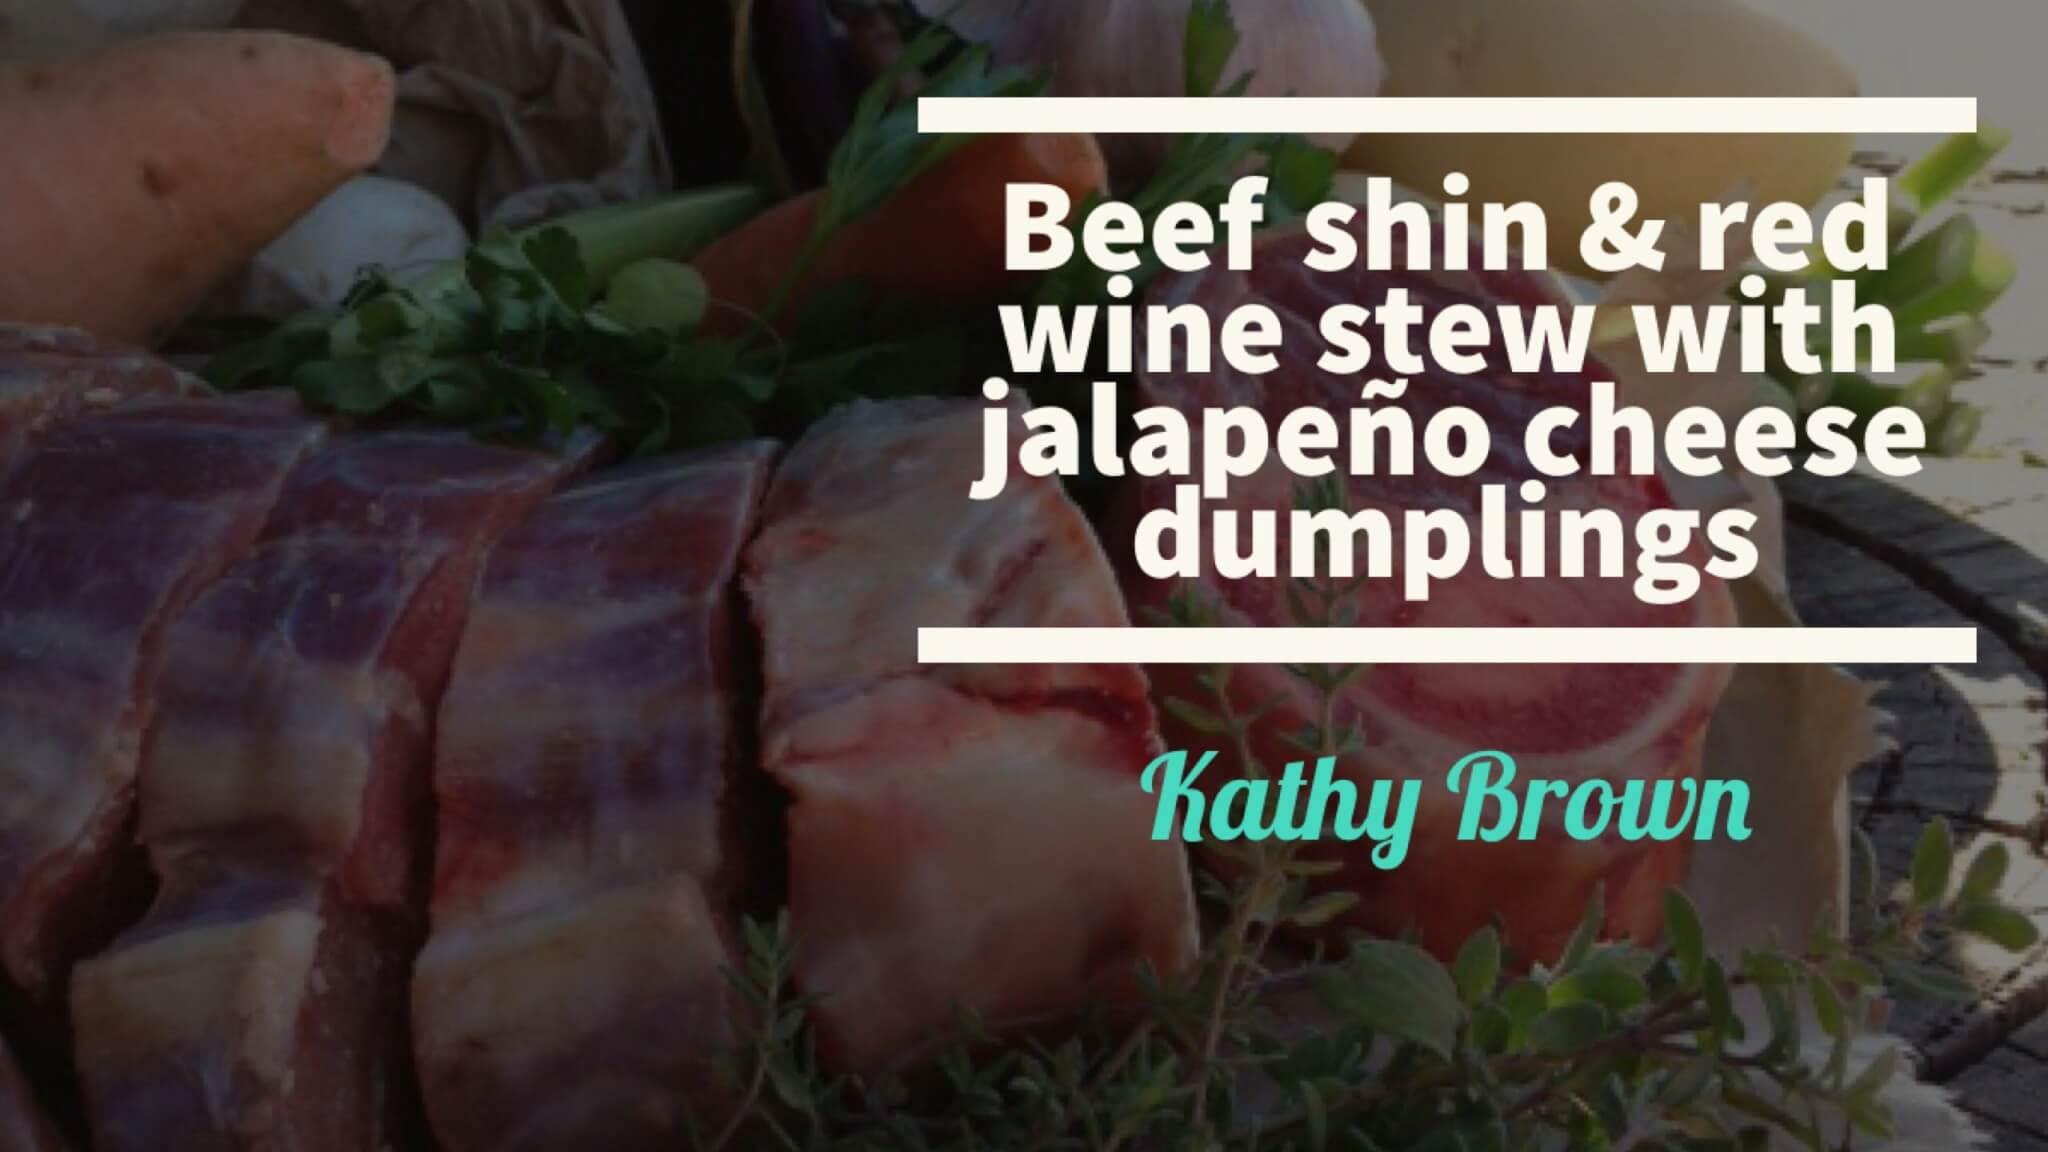 Beef Shin & Red Wine Stew with Jalapeño Cheese Dumplings